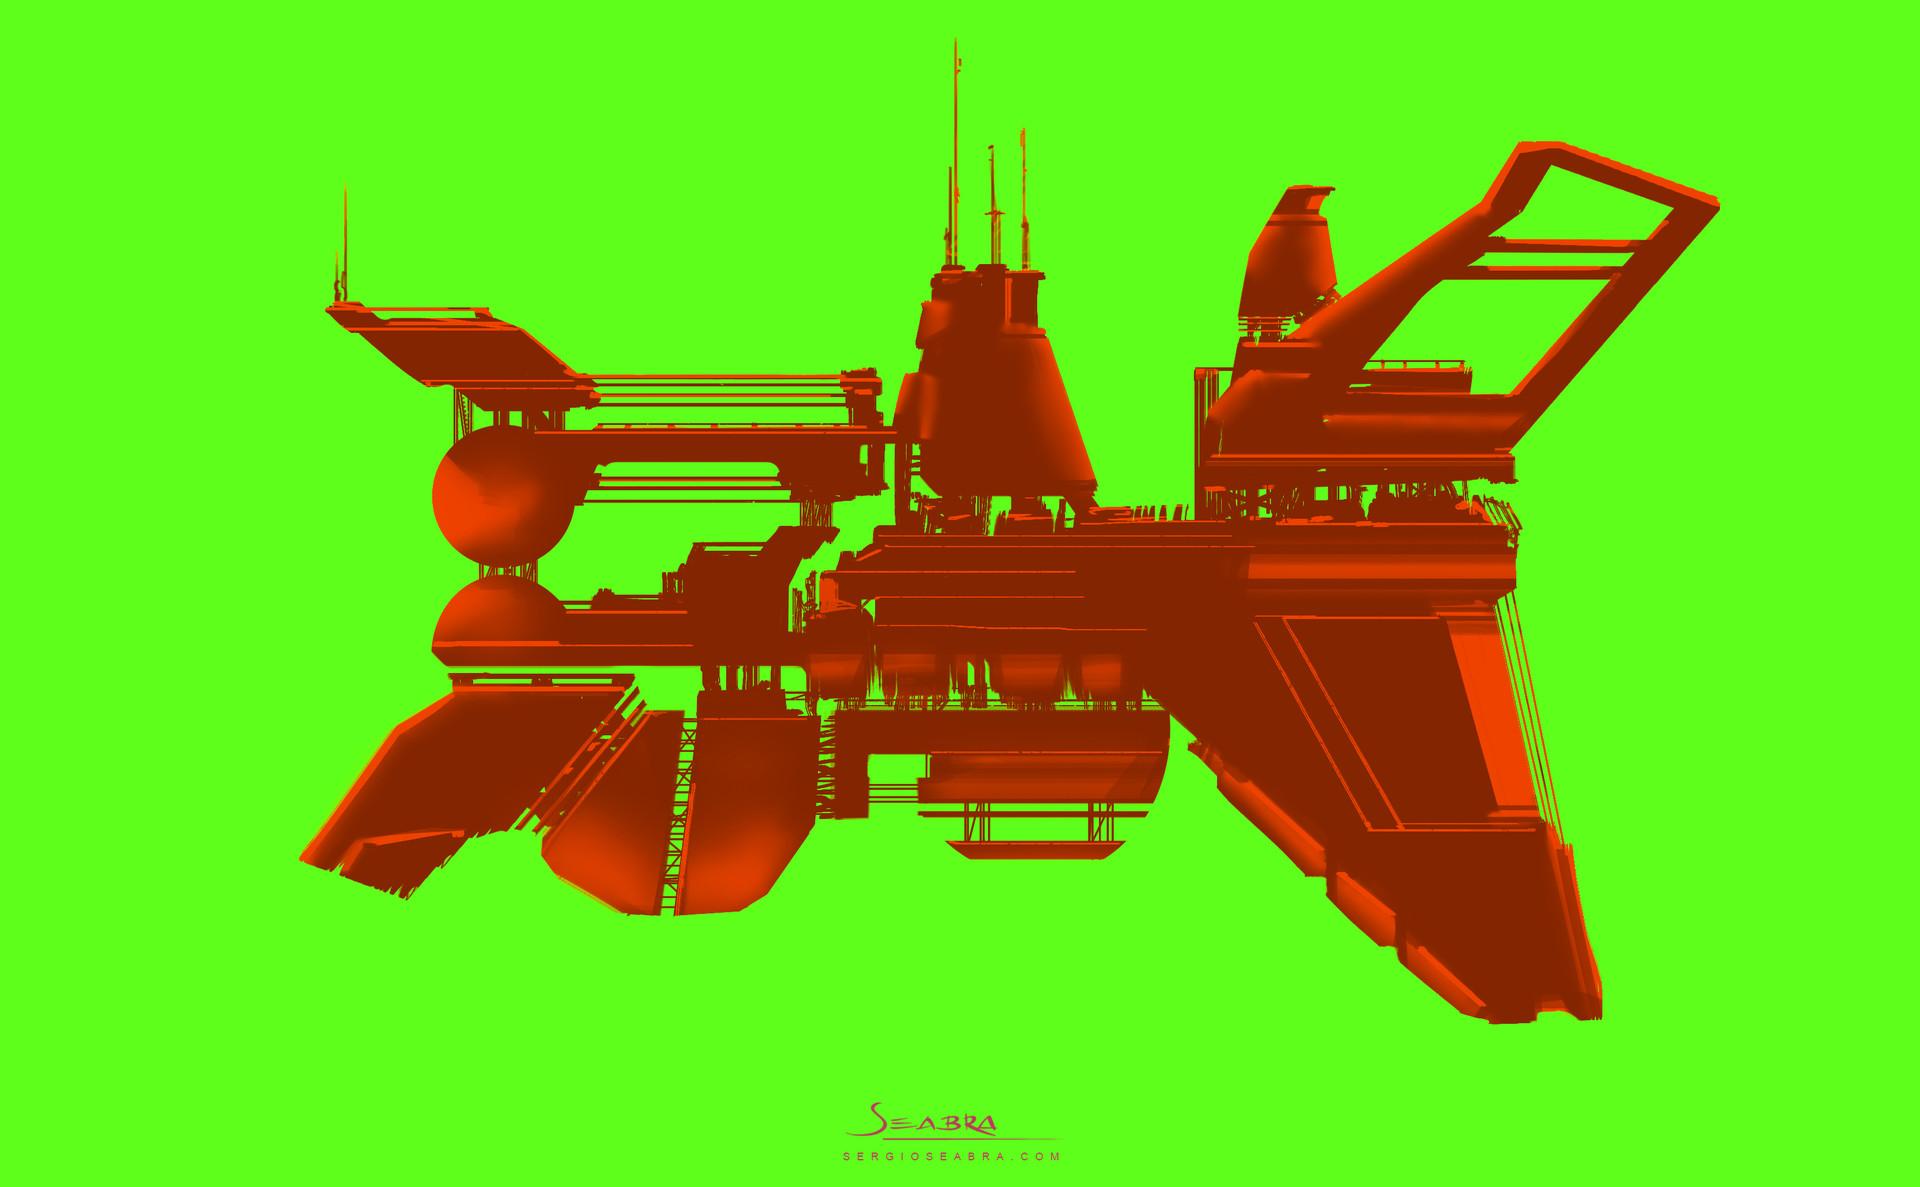 Sergio seabra 2016 spaceship expl ss2